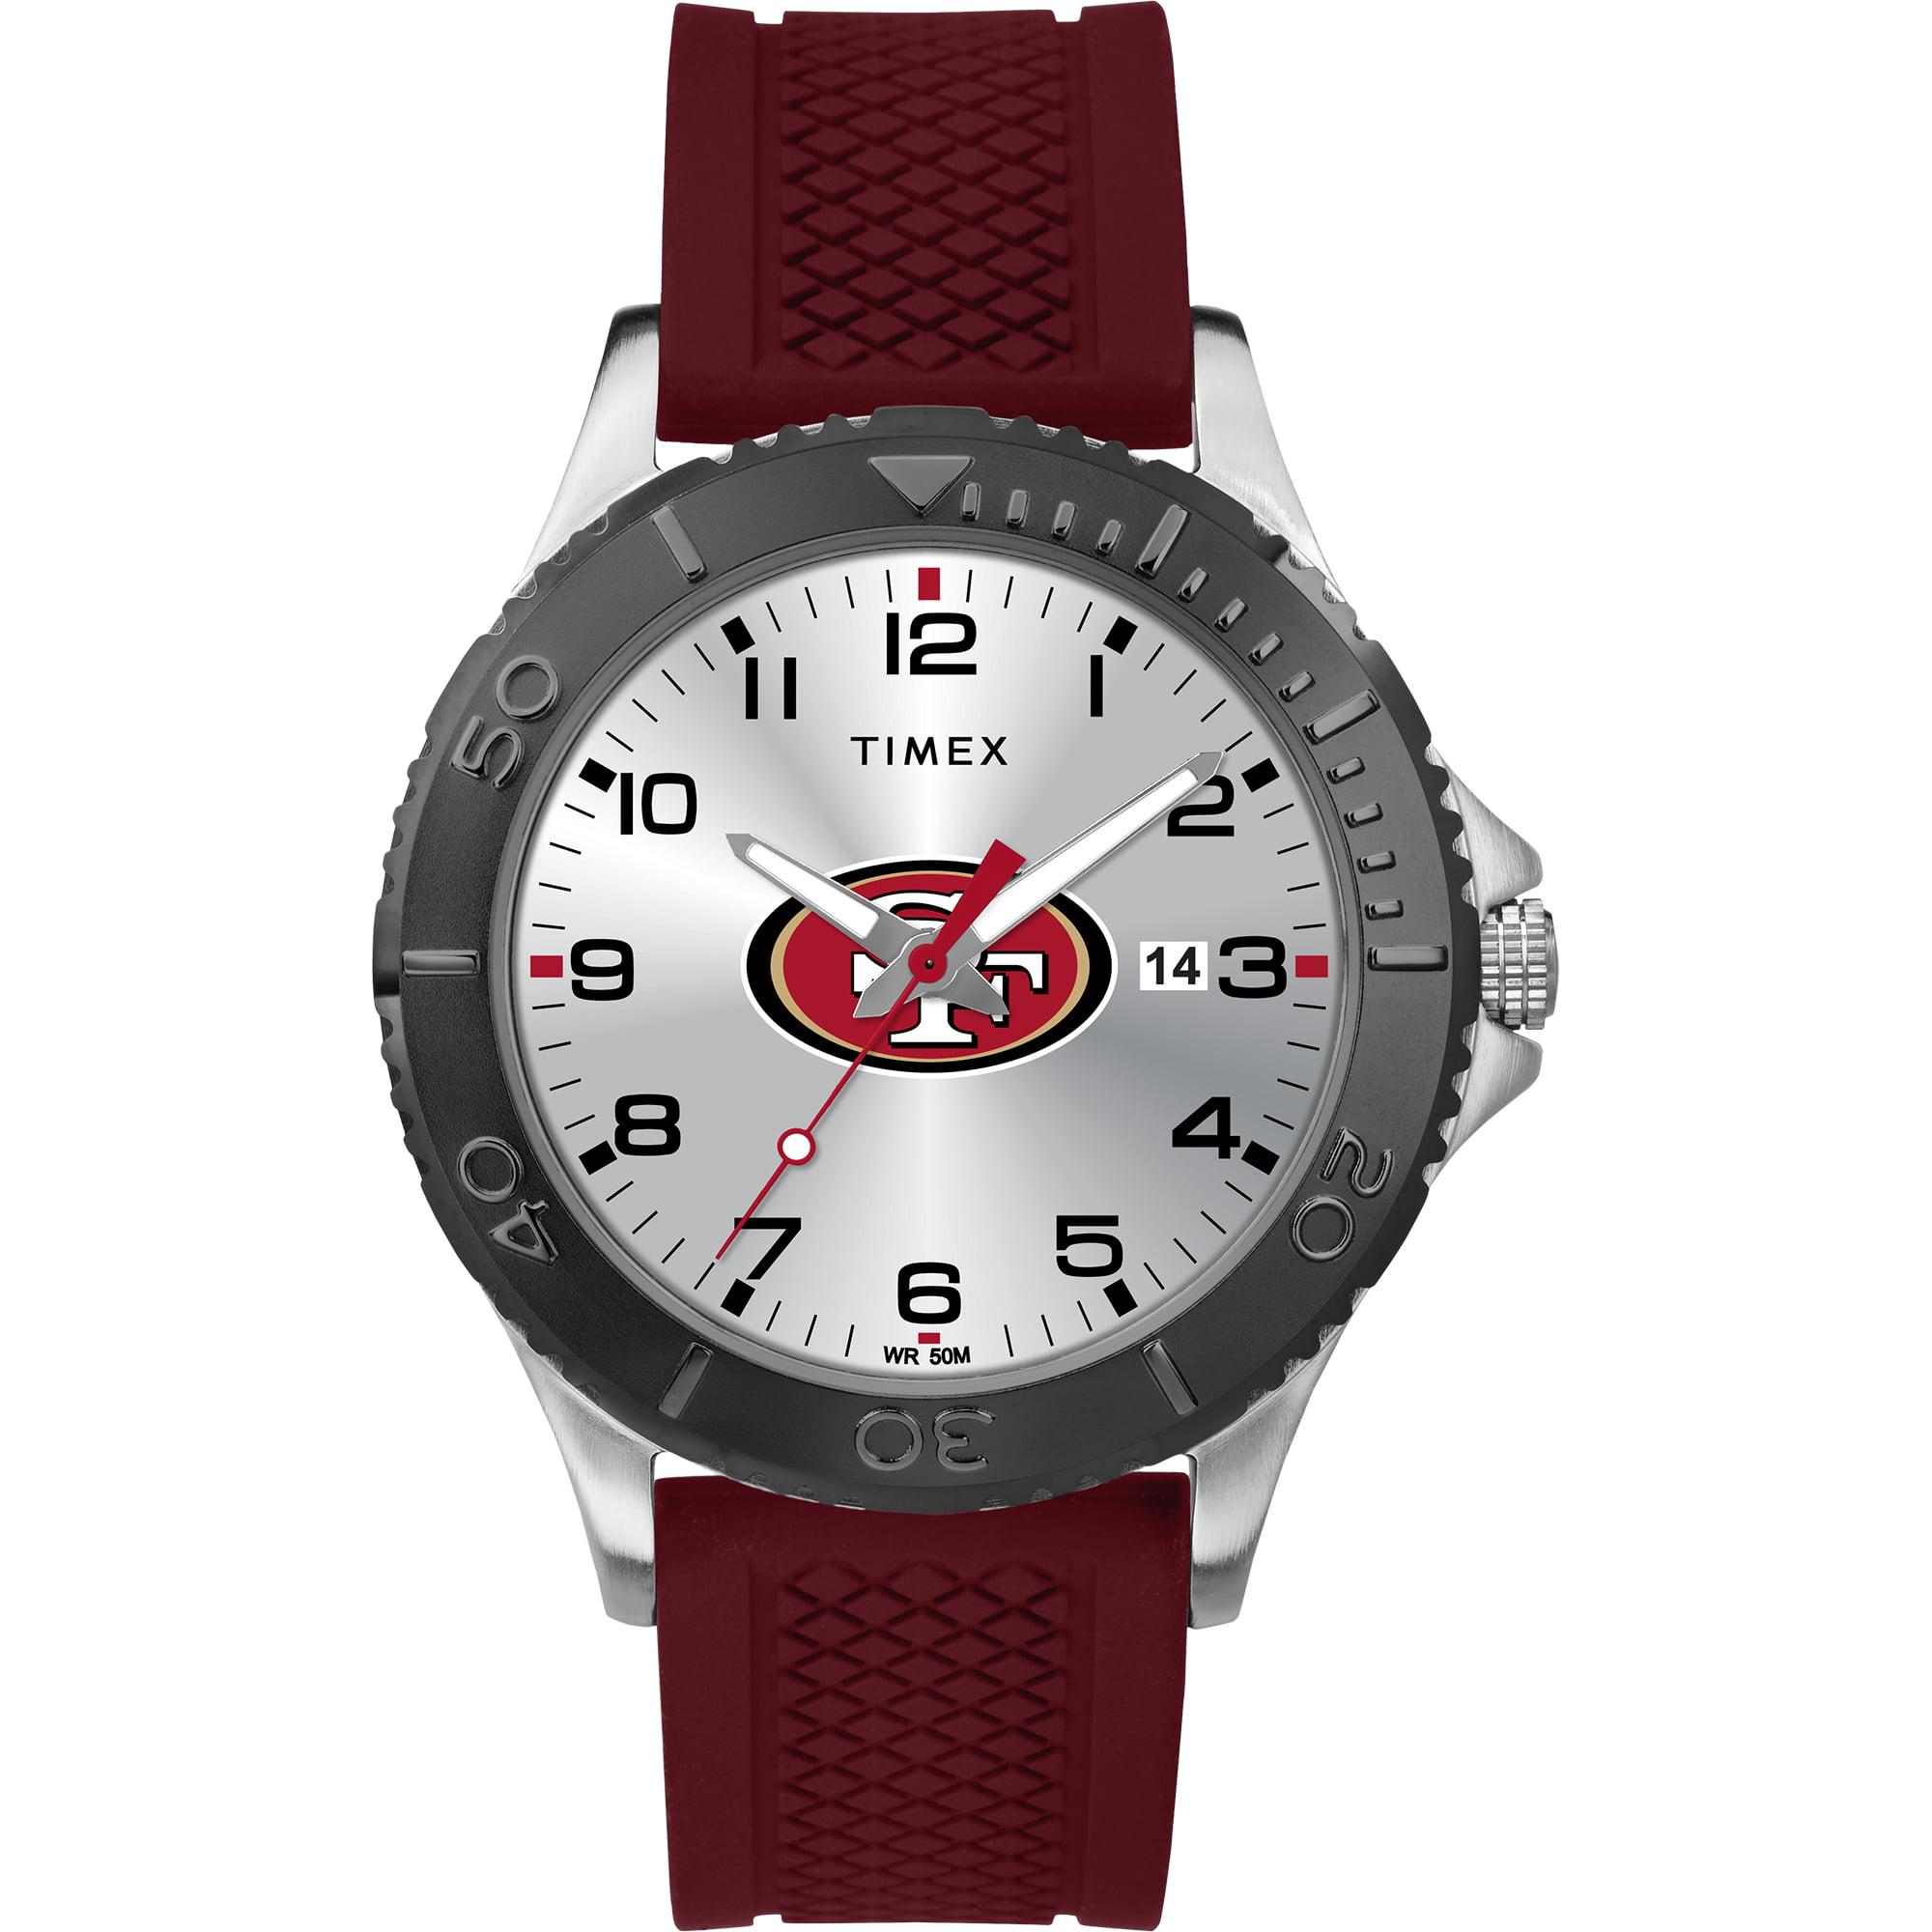 Timex - NFL Tribute Collection Gamer Crimson Men's Watch, San Francisco 49ers